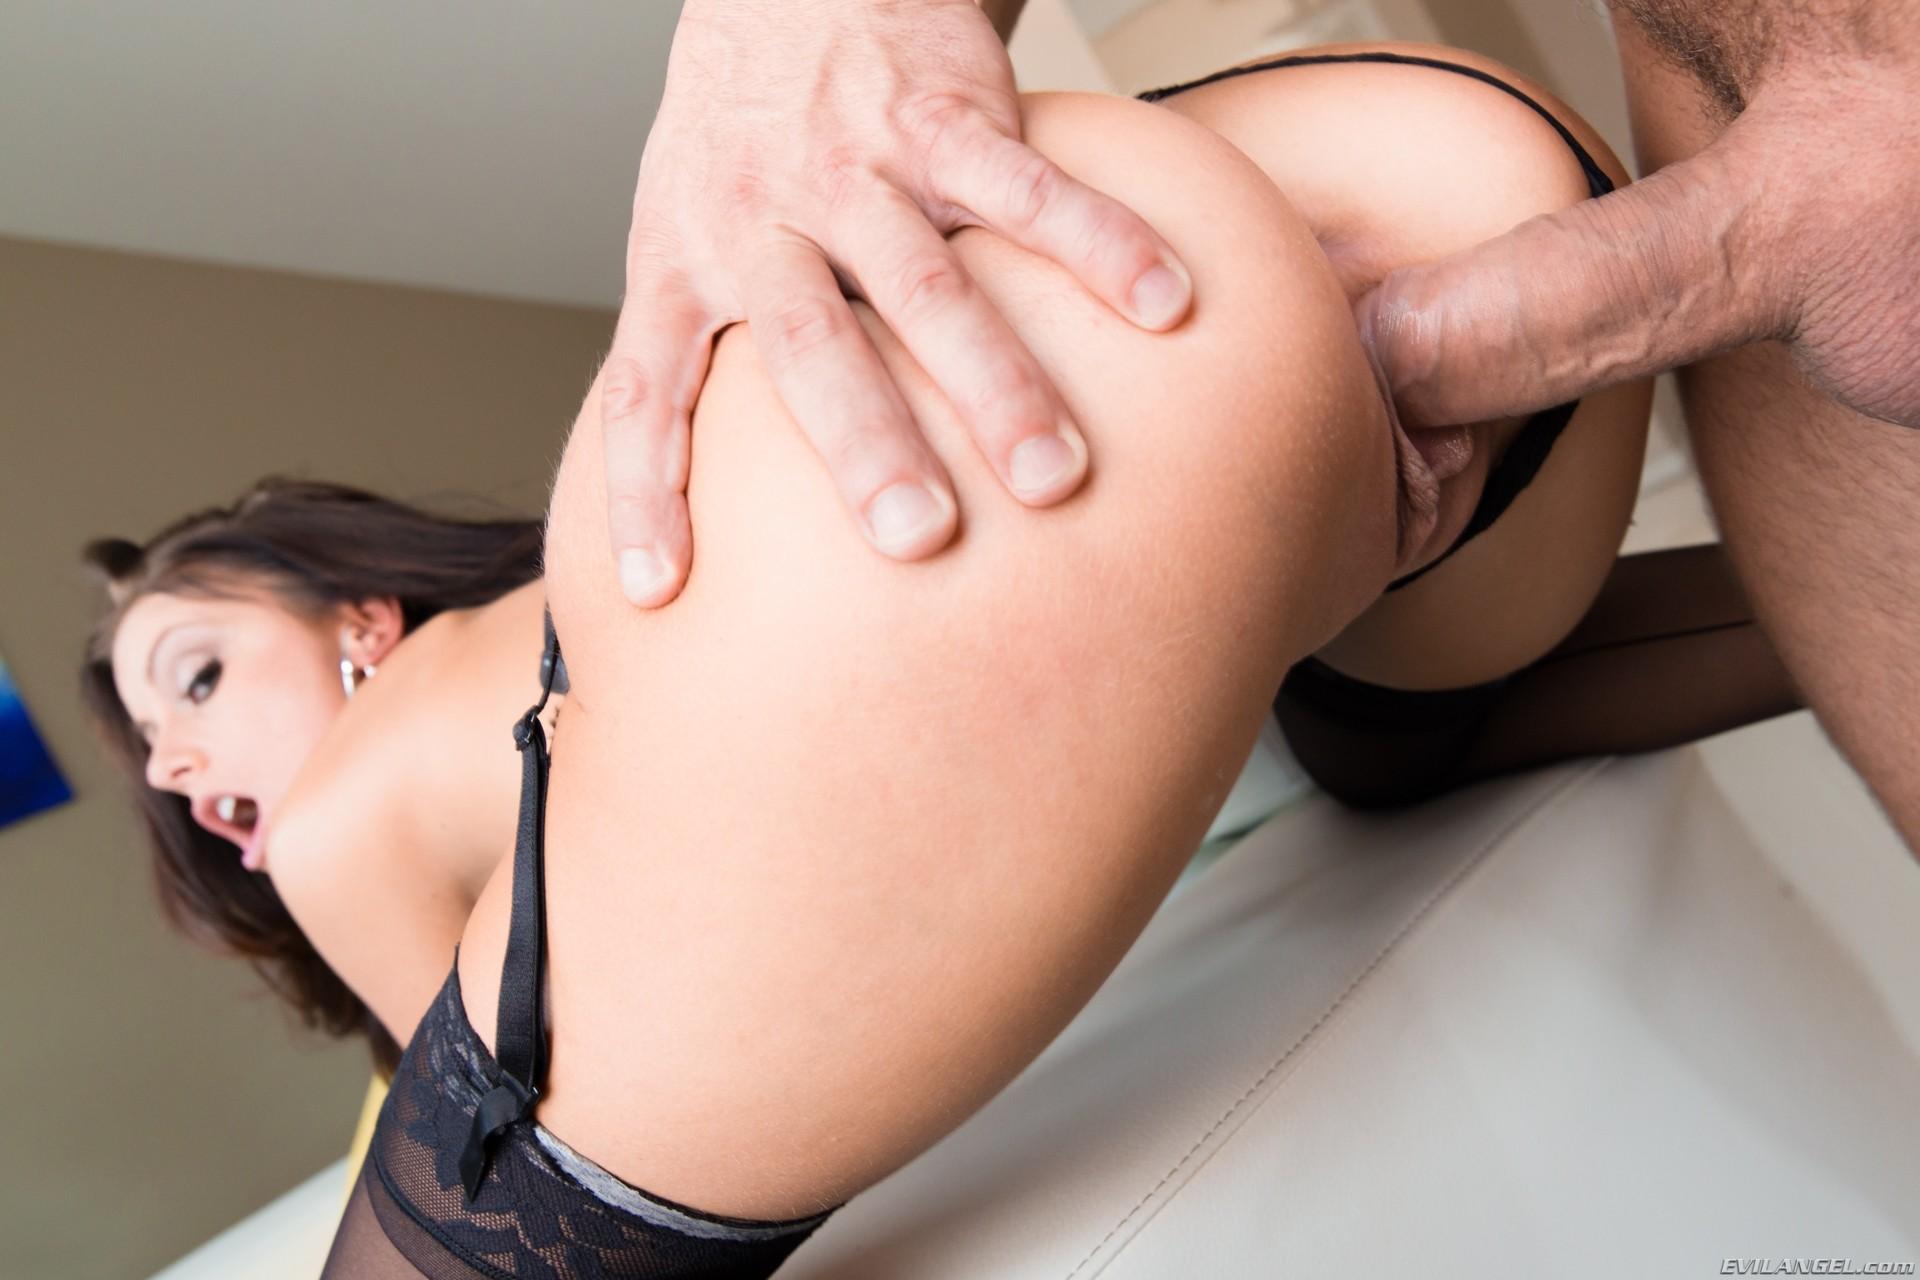 Hot tattooed sister deepthroating huge cock brutally fucked 6